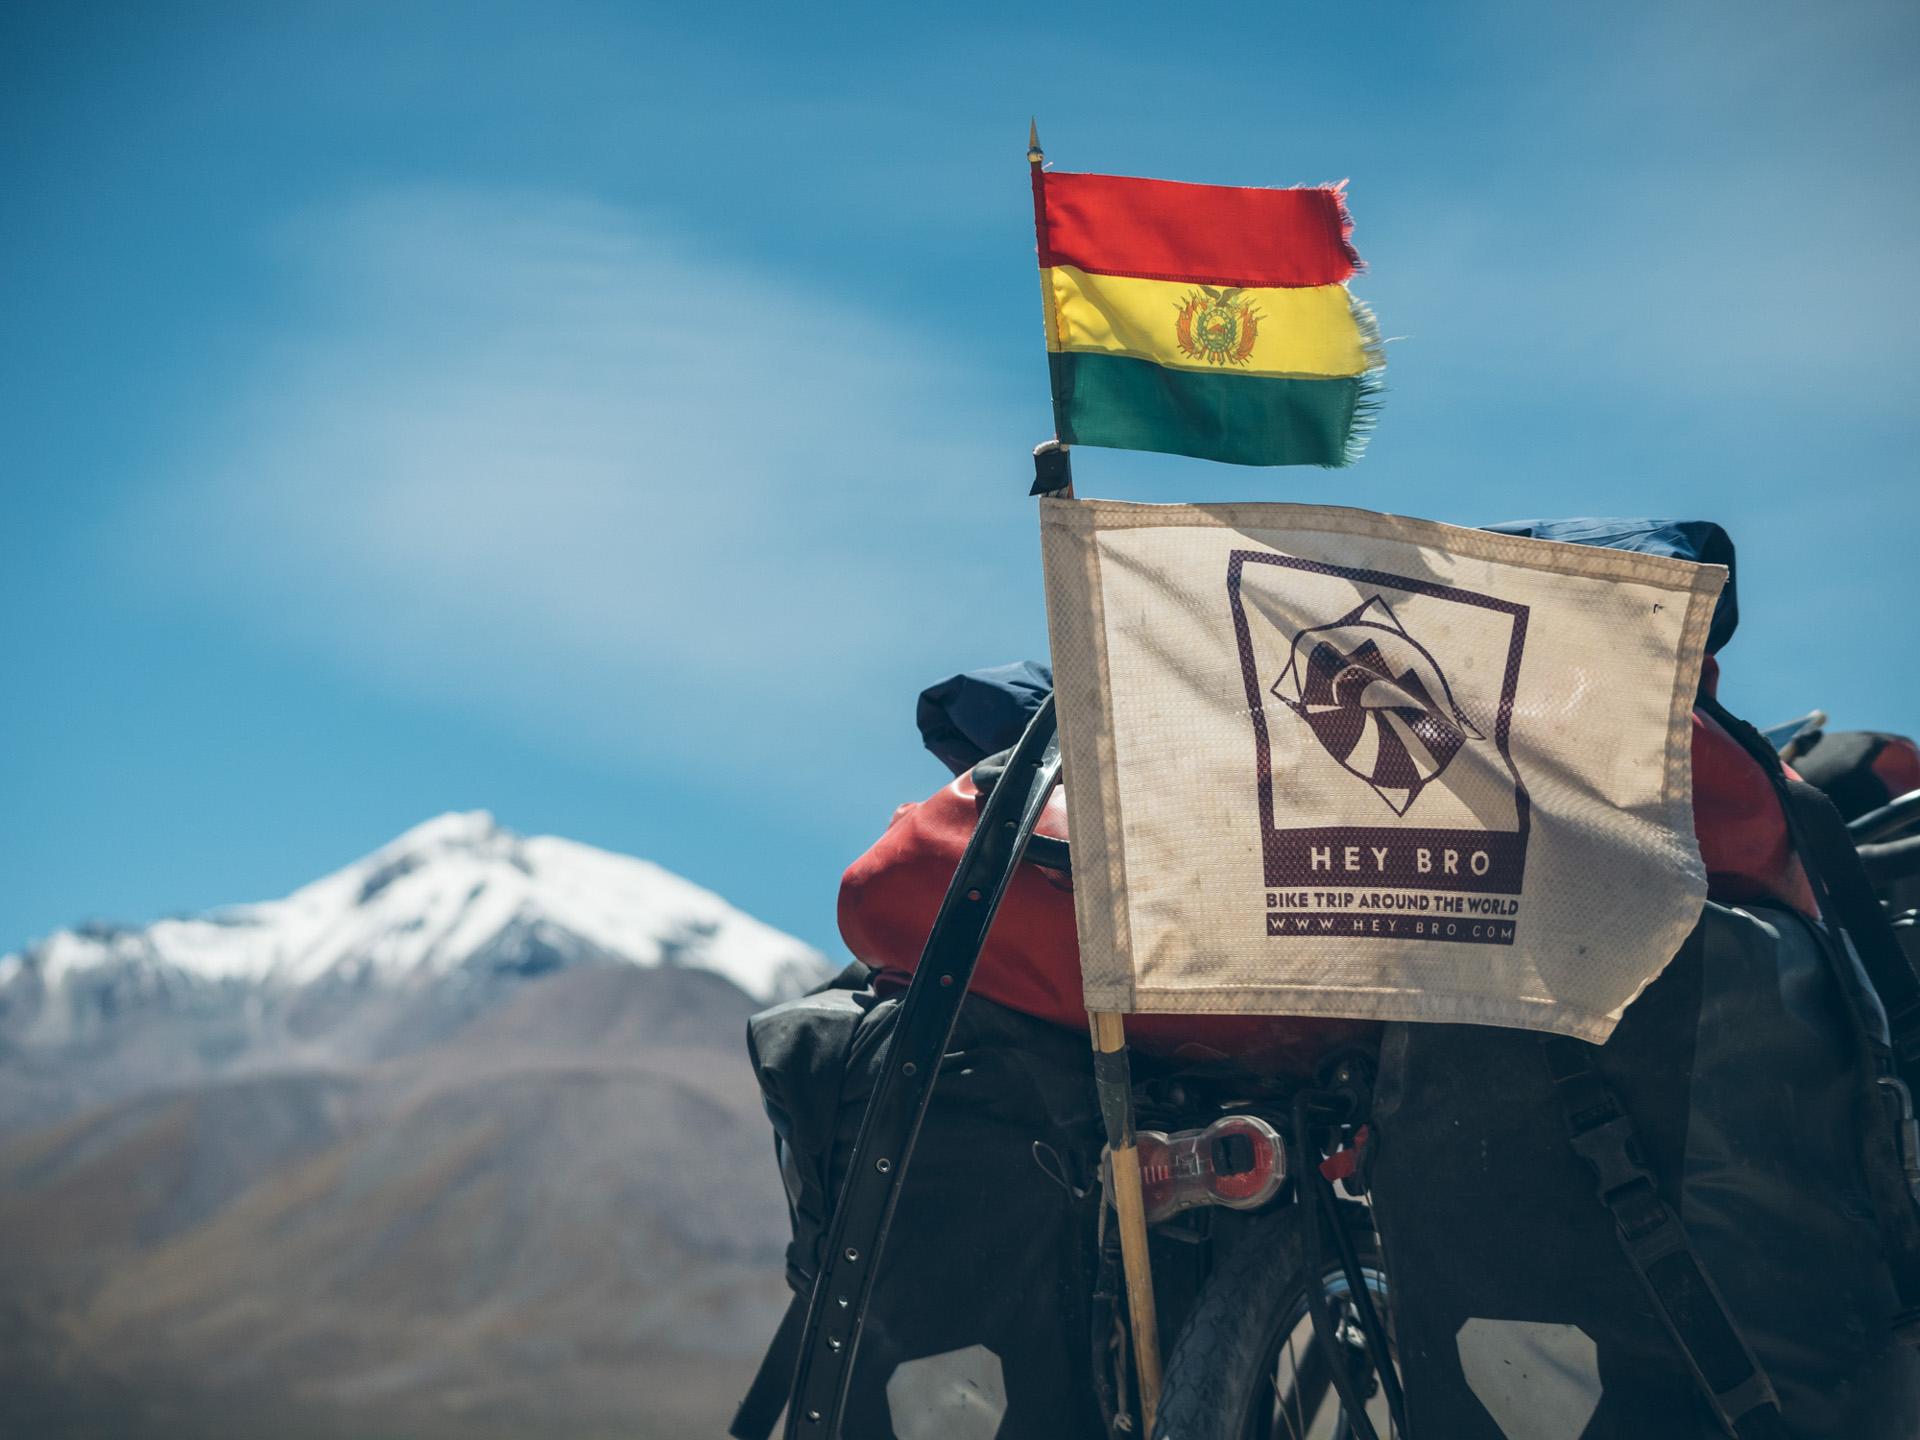 VIVA BOLIVIA